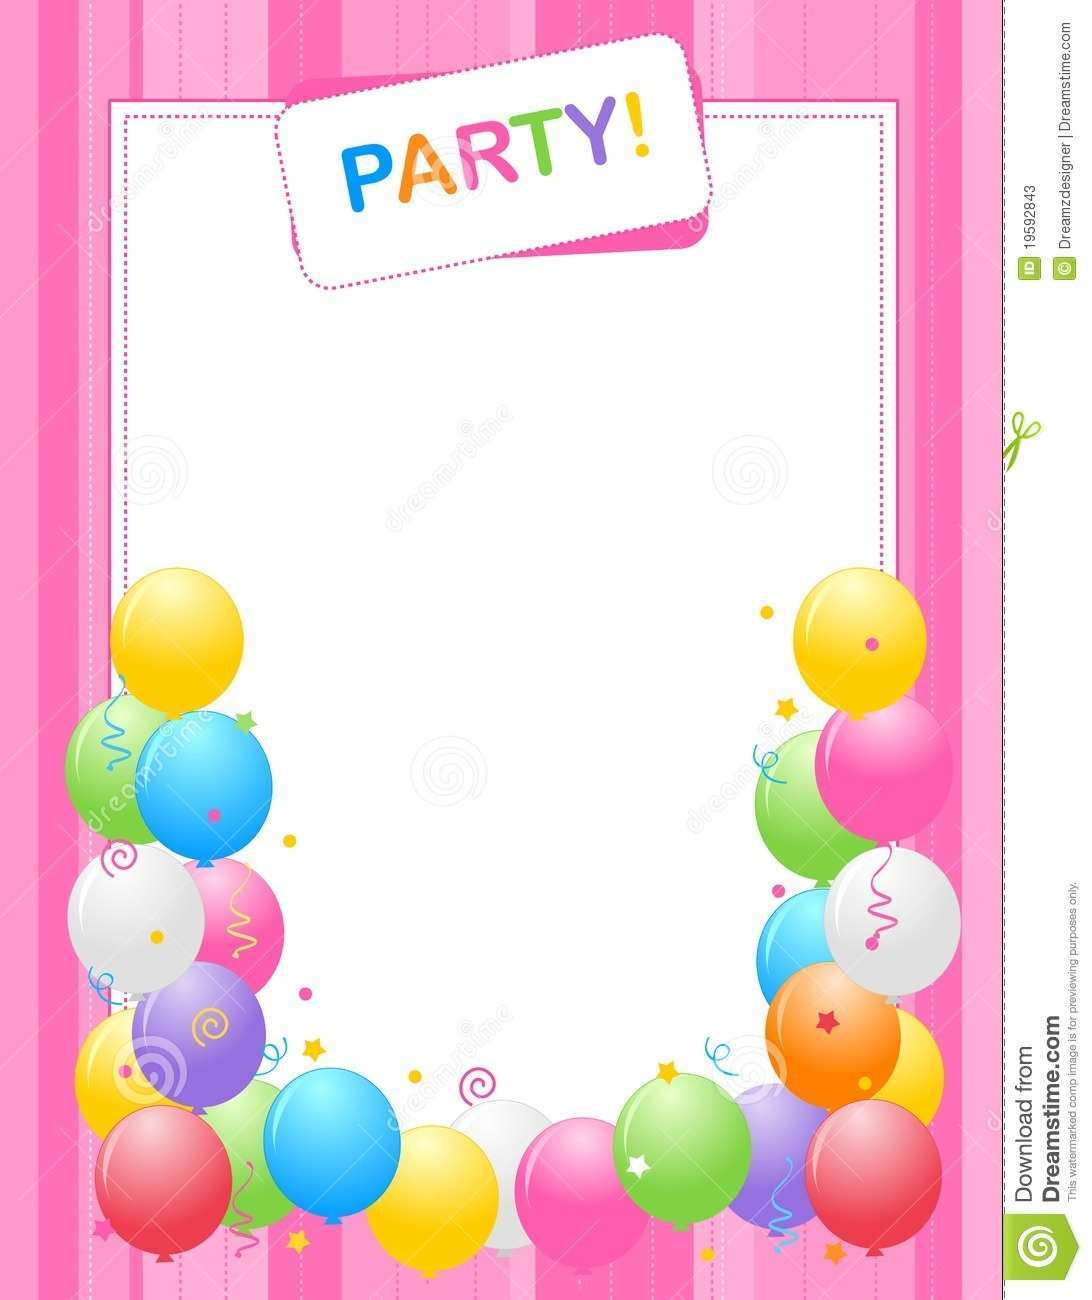 birthday invitation background designs